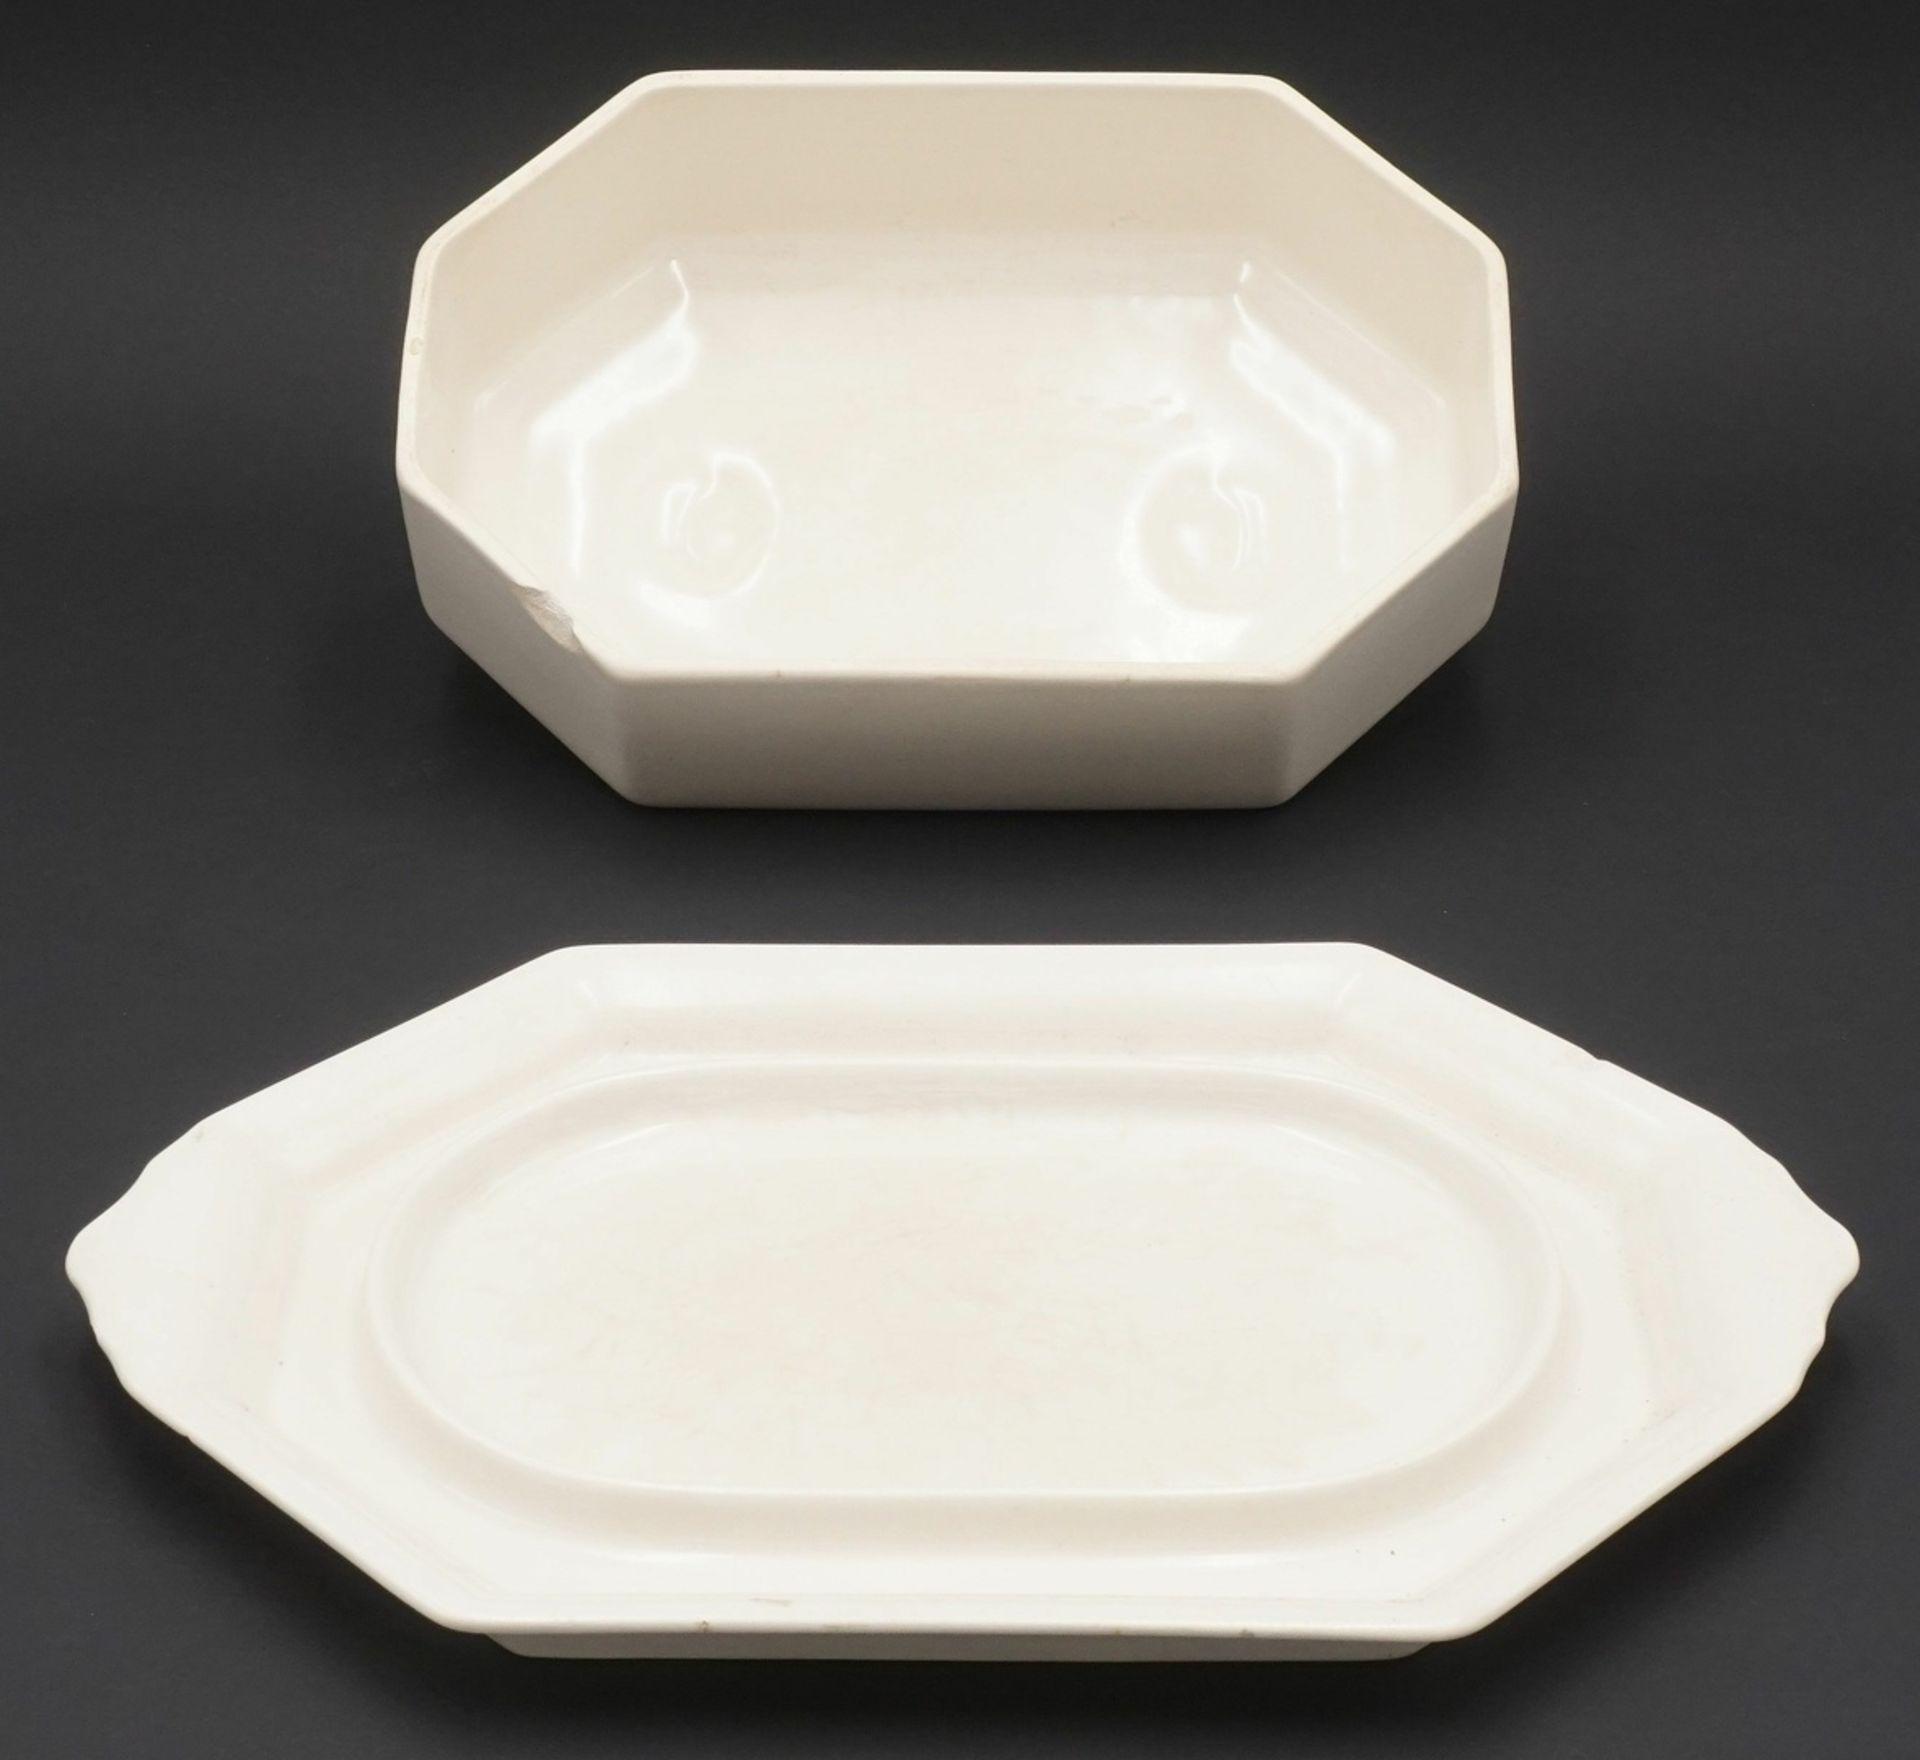 Villeroy & Boch Deckeldose / Brotdose - Bild 3 aus 4